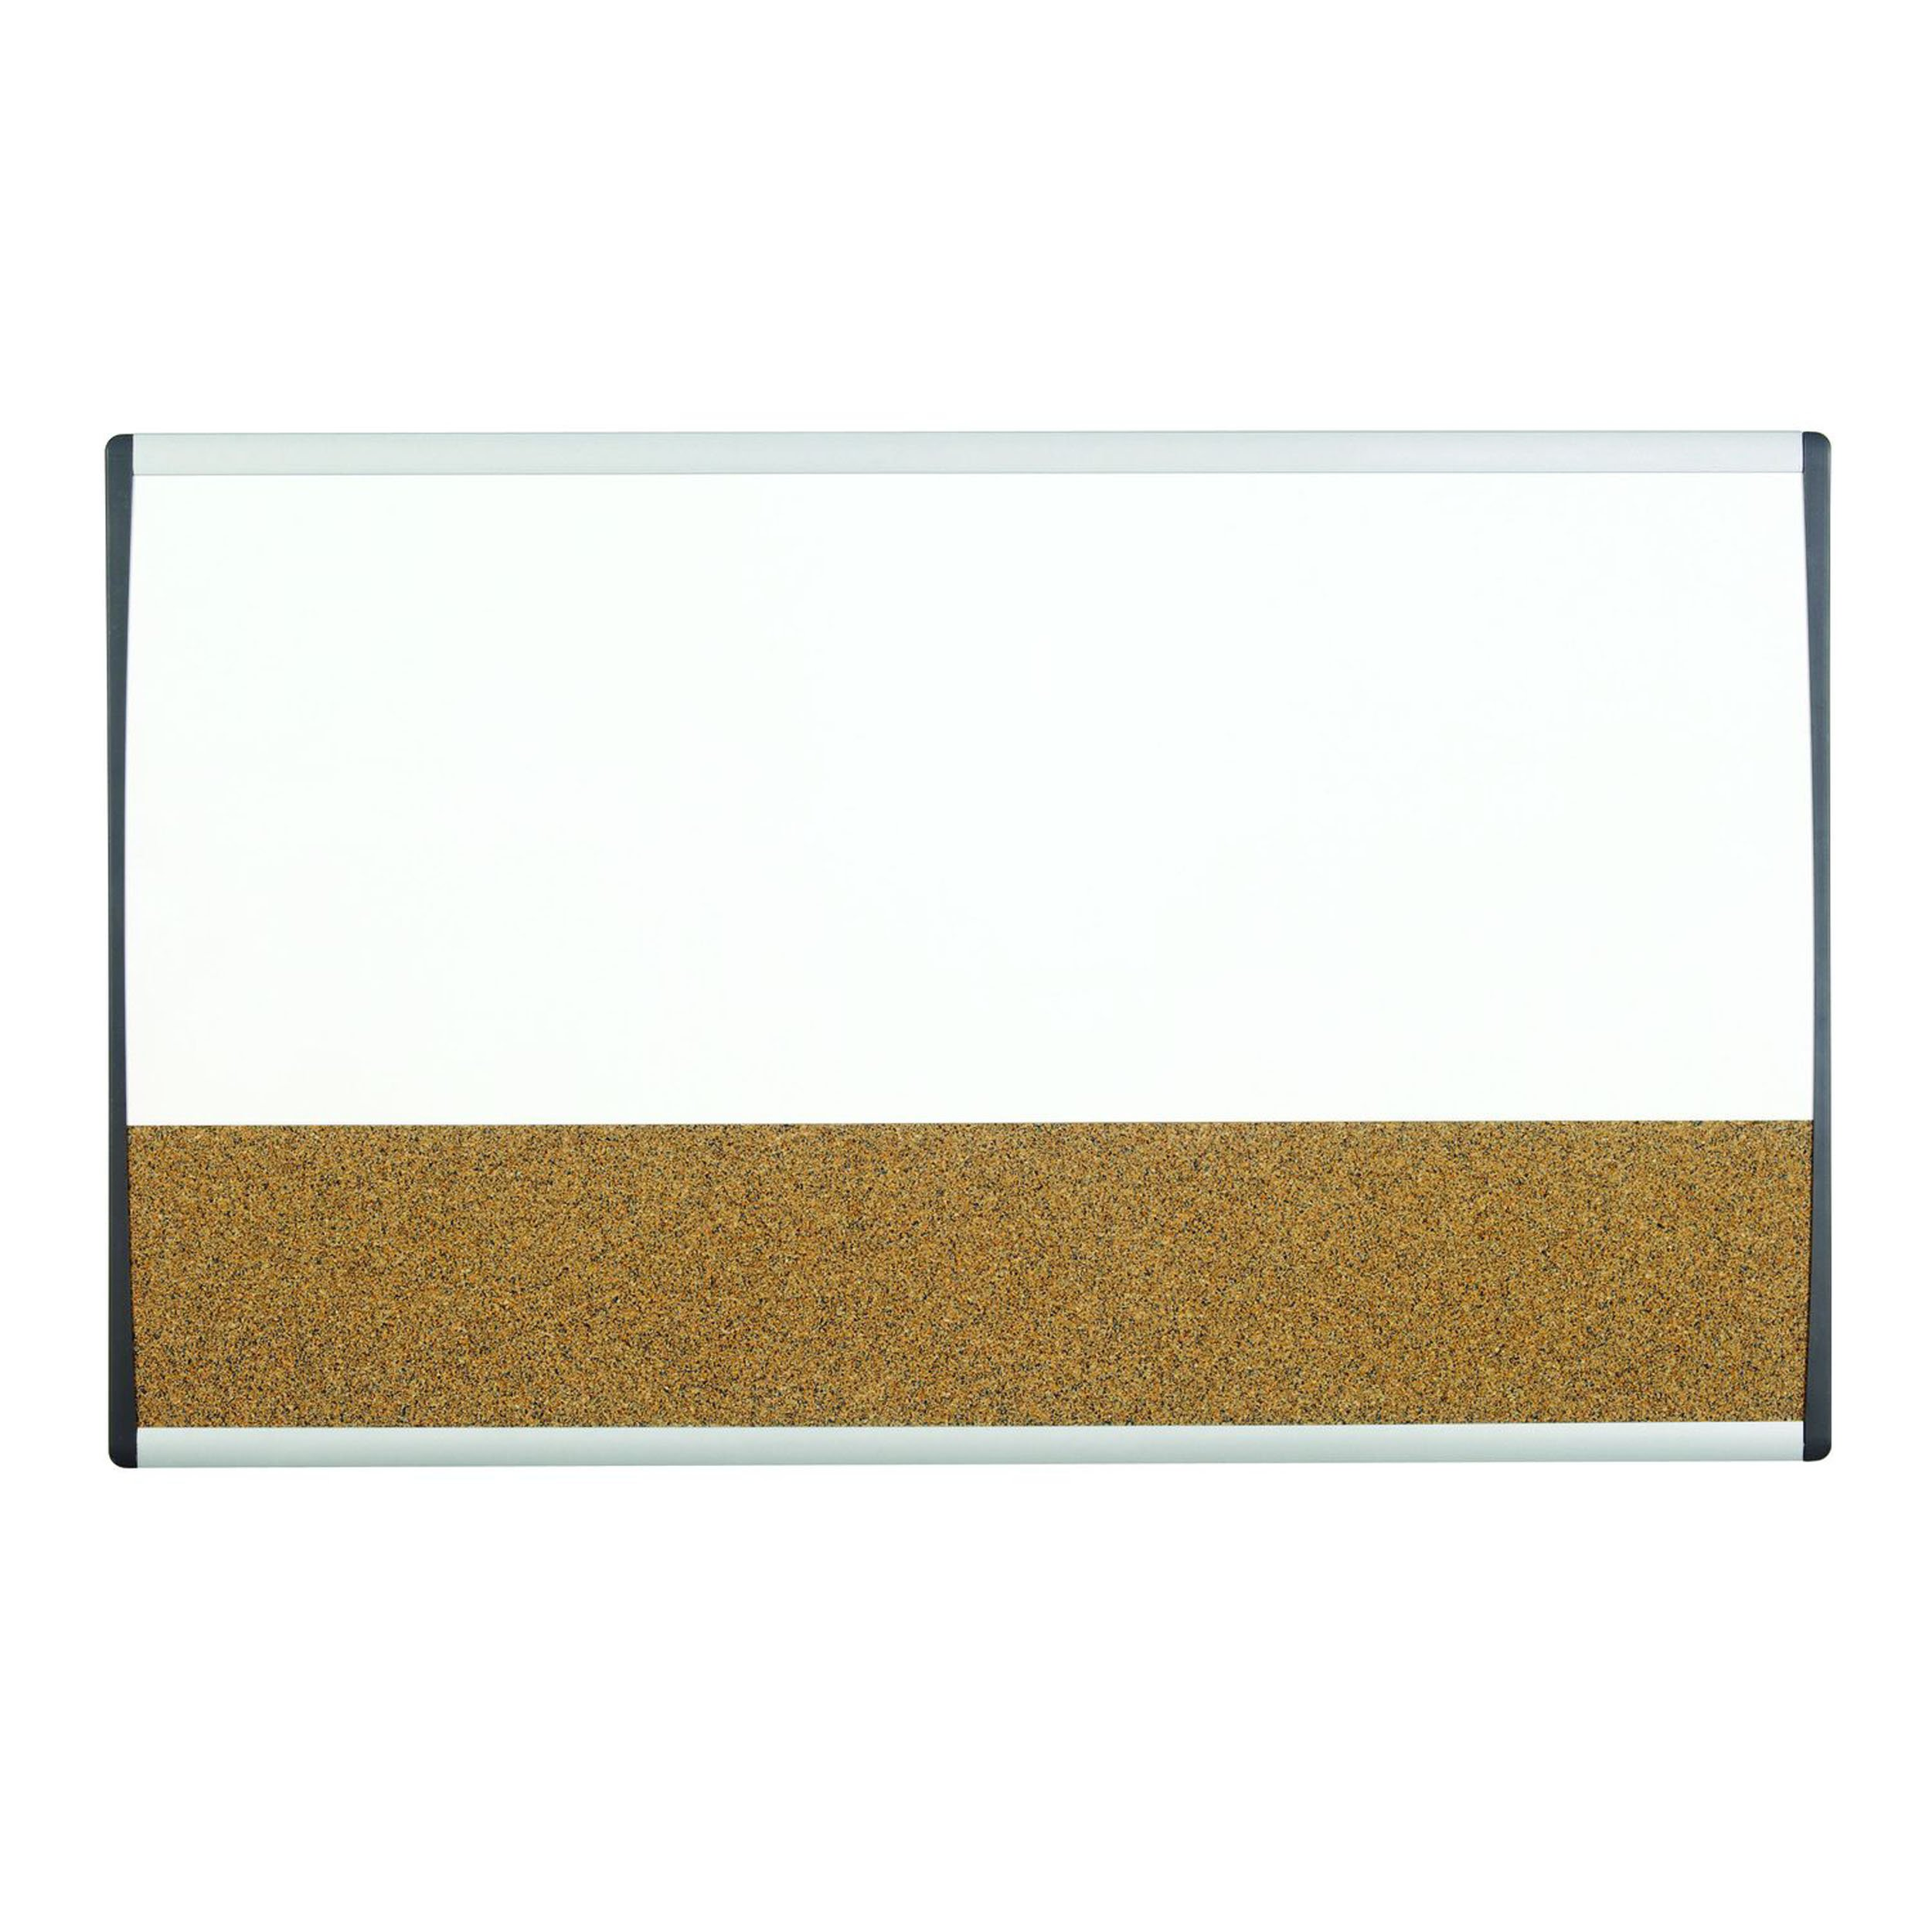 Quartet Arc Cubicle Combination Board, 30'' x 18'', Whiteboard/Cork Surface, Aluminum Frame (ARCCB3018)